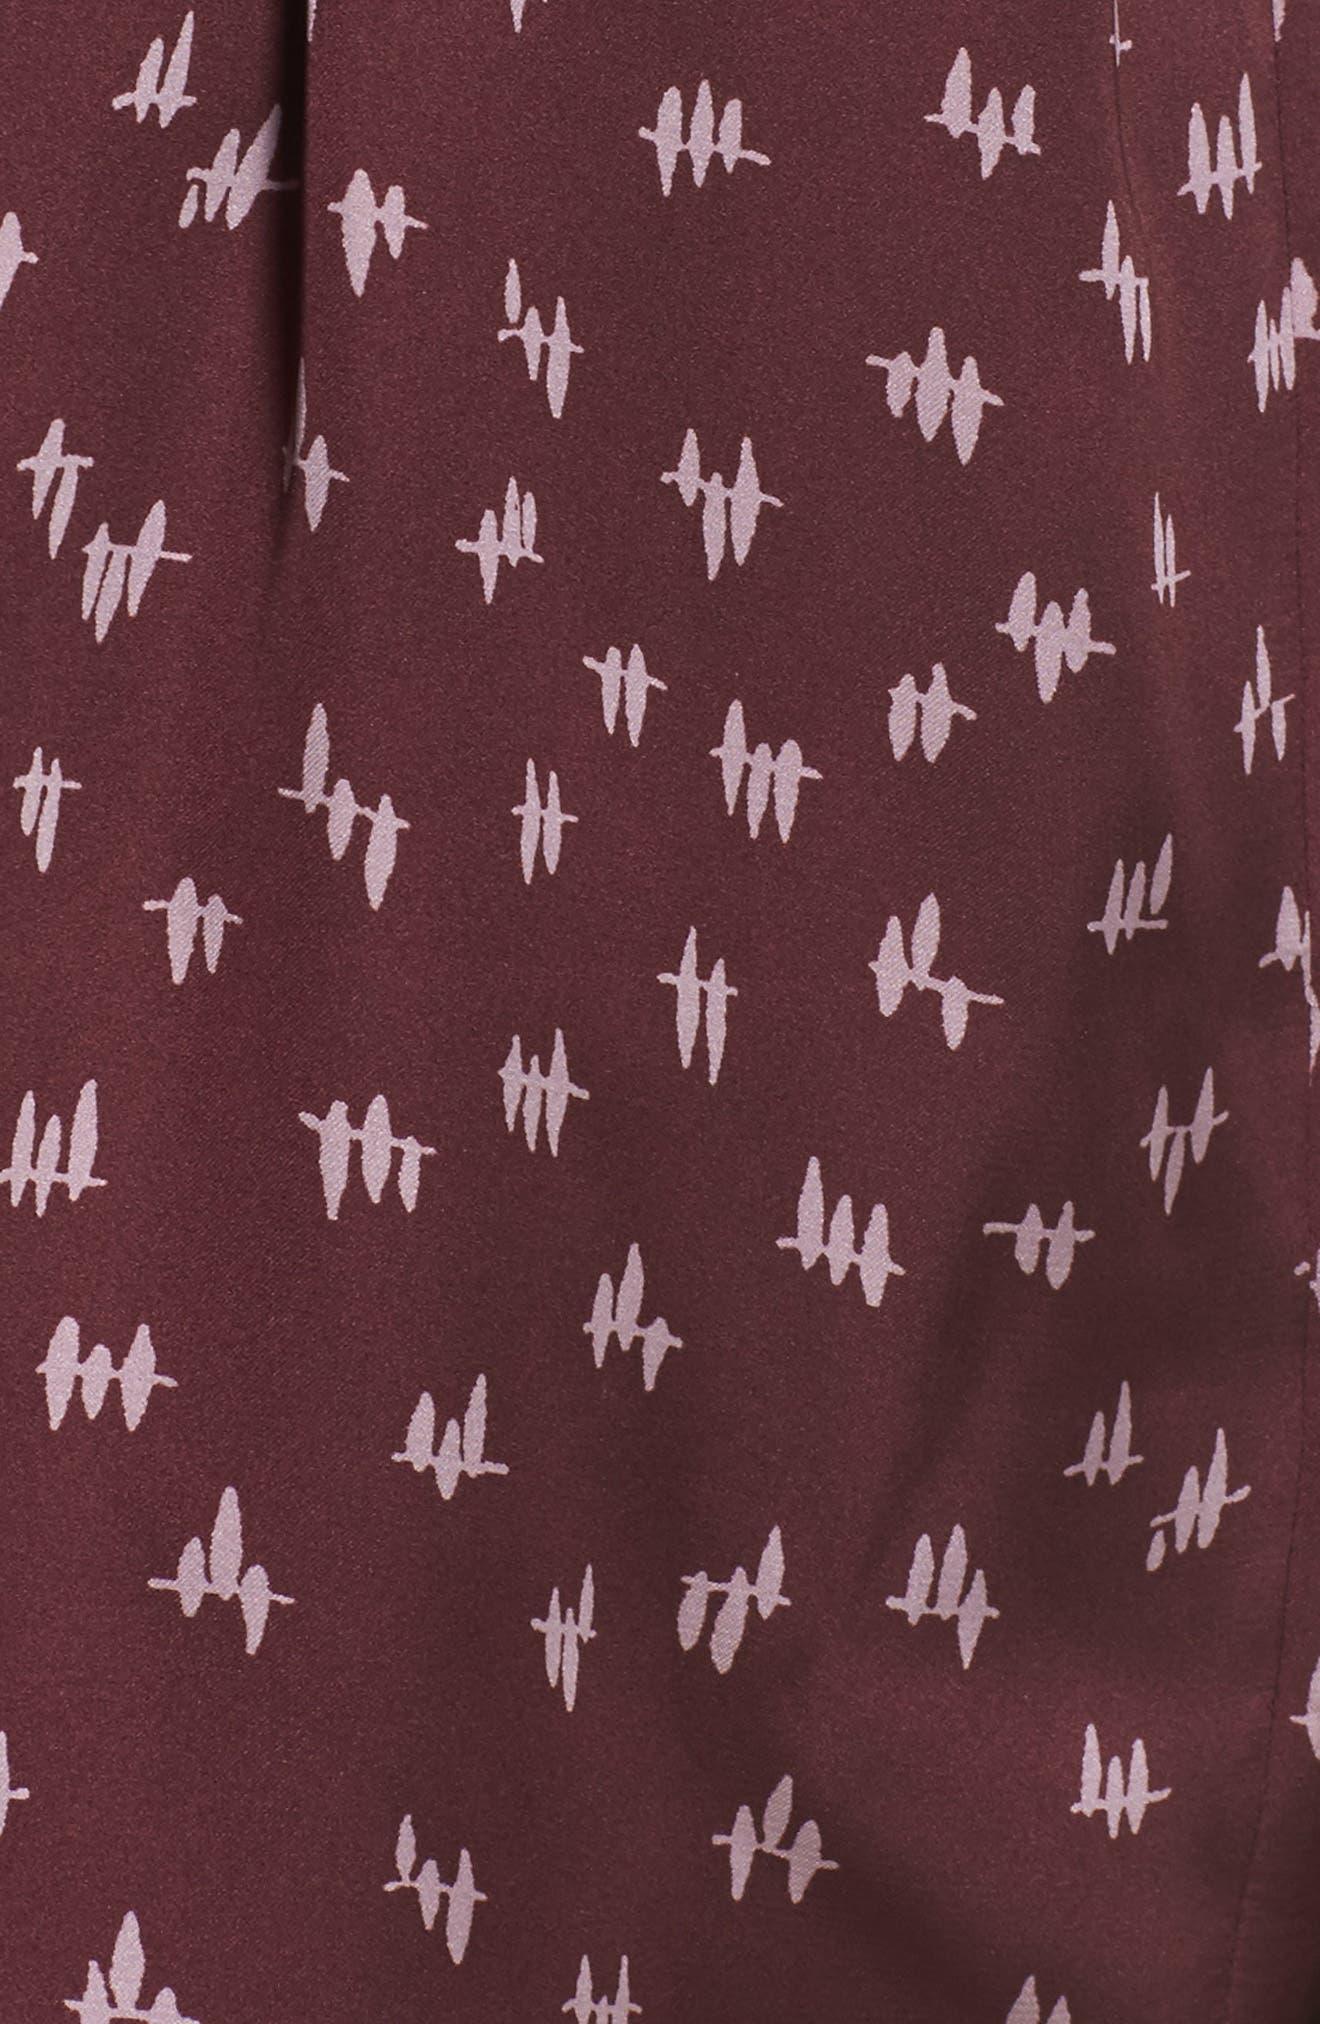 Wrap Satin Pajamas,                             Alternate thumbnail 4, color,                             930